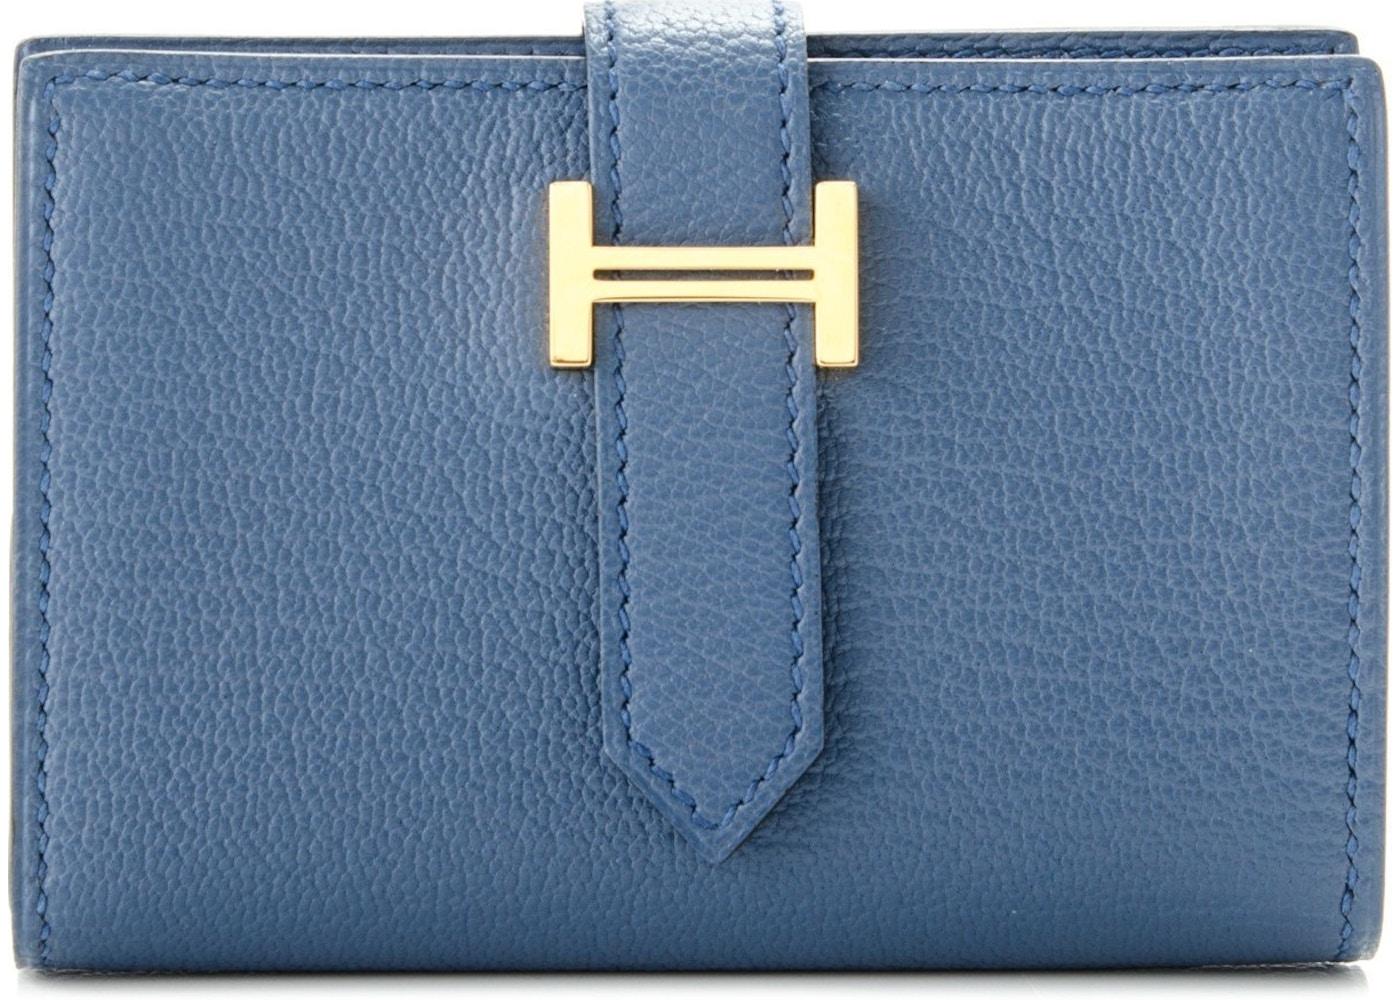 6f5cb3663e25 Hermes Wallet Bearn Compact Chevre Mysore Mini Bleu Agate. Chevre Mysore  Mini Bleu Agate